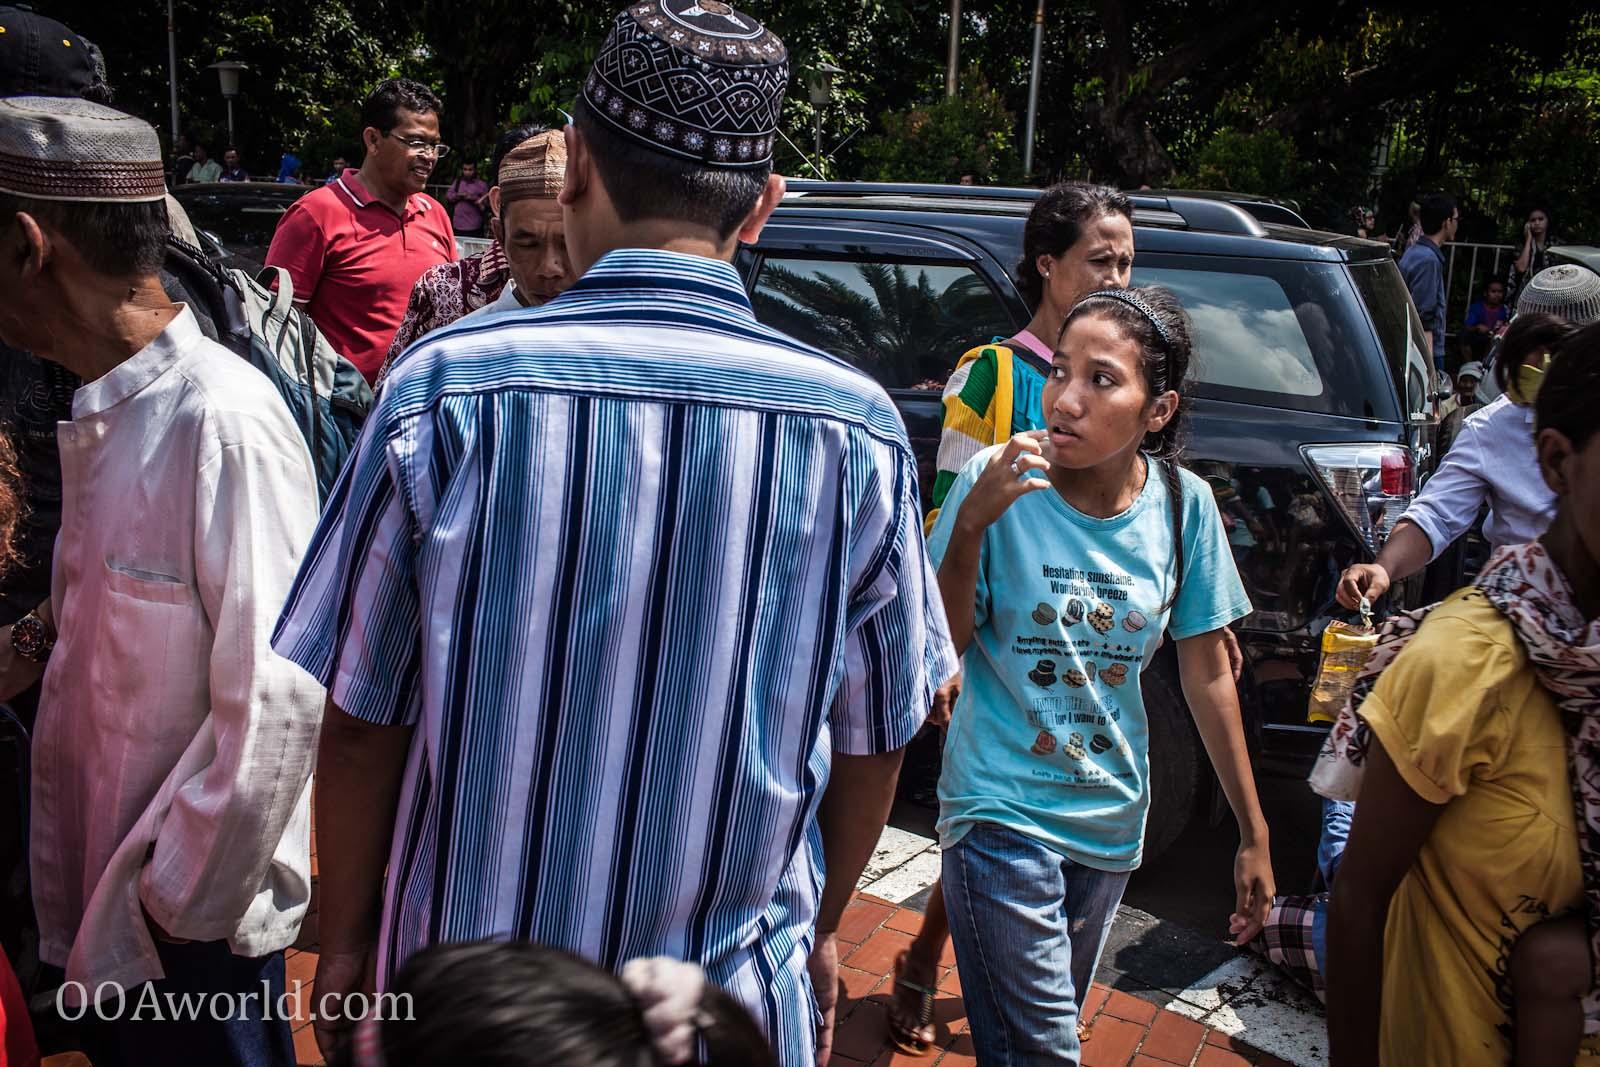 Masjid Istiqlal Front Crowd Photo Ooaworld